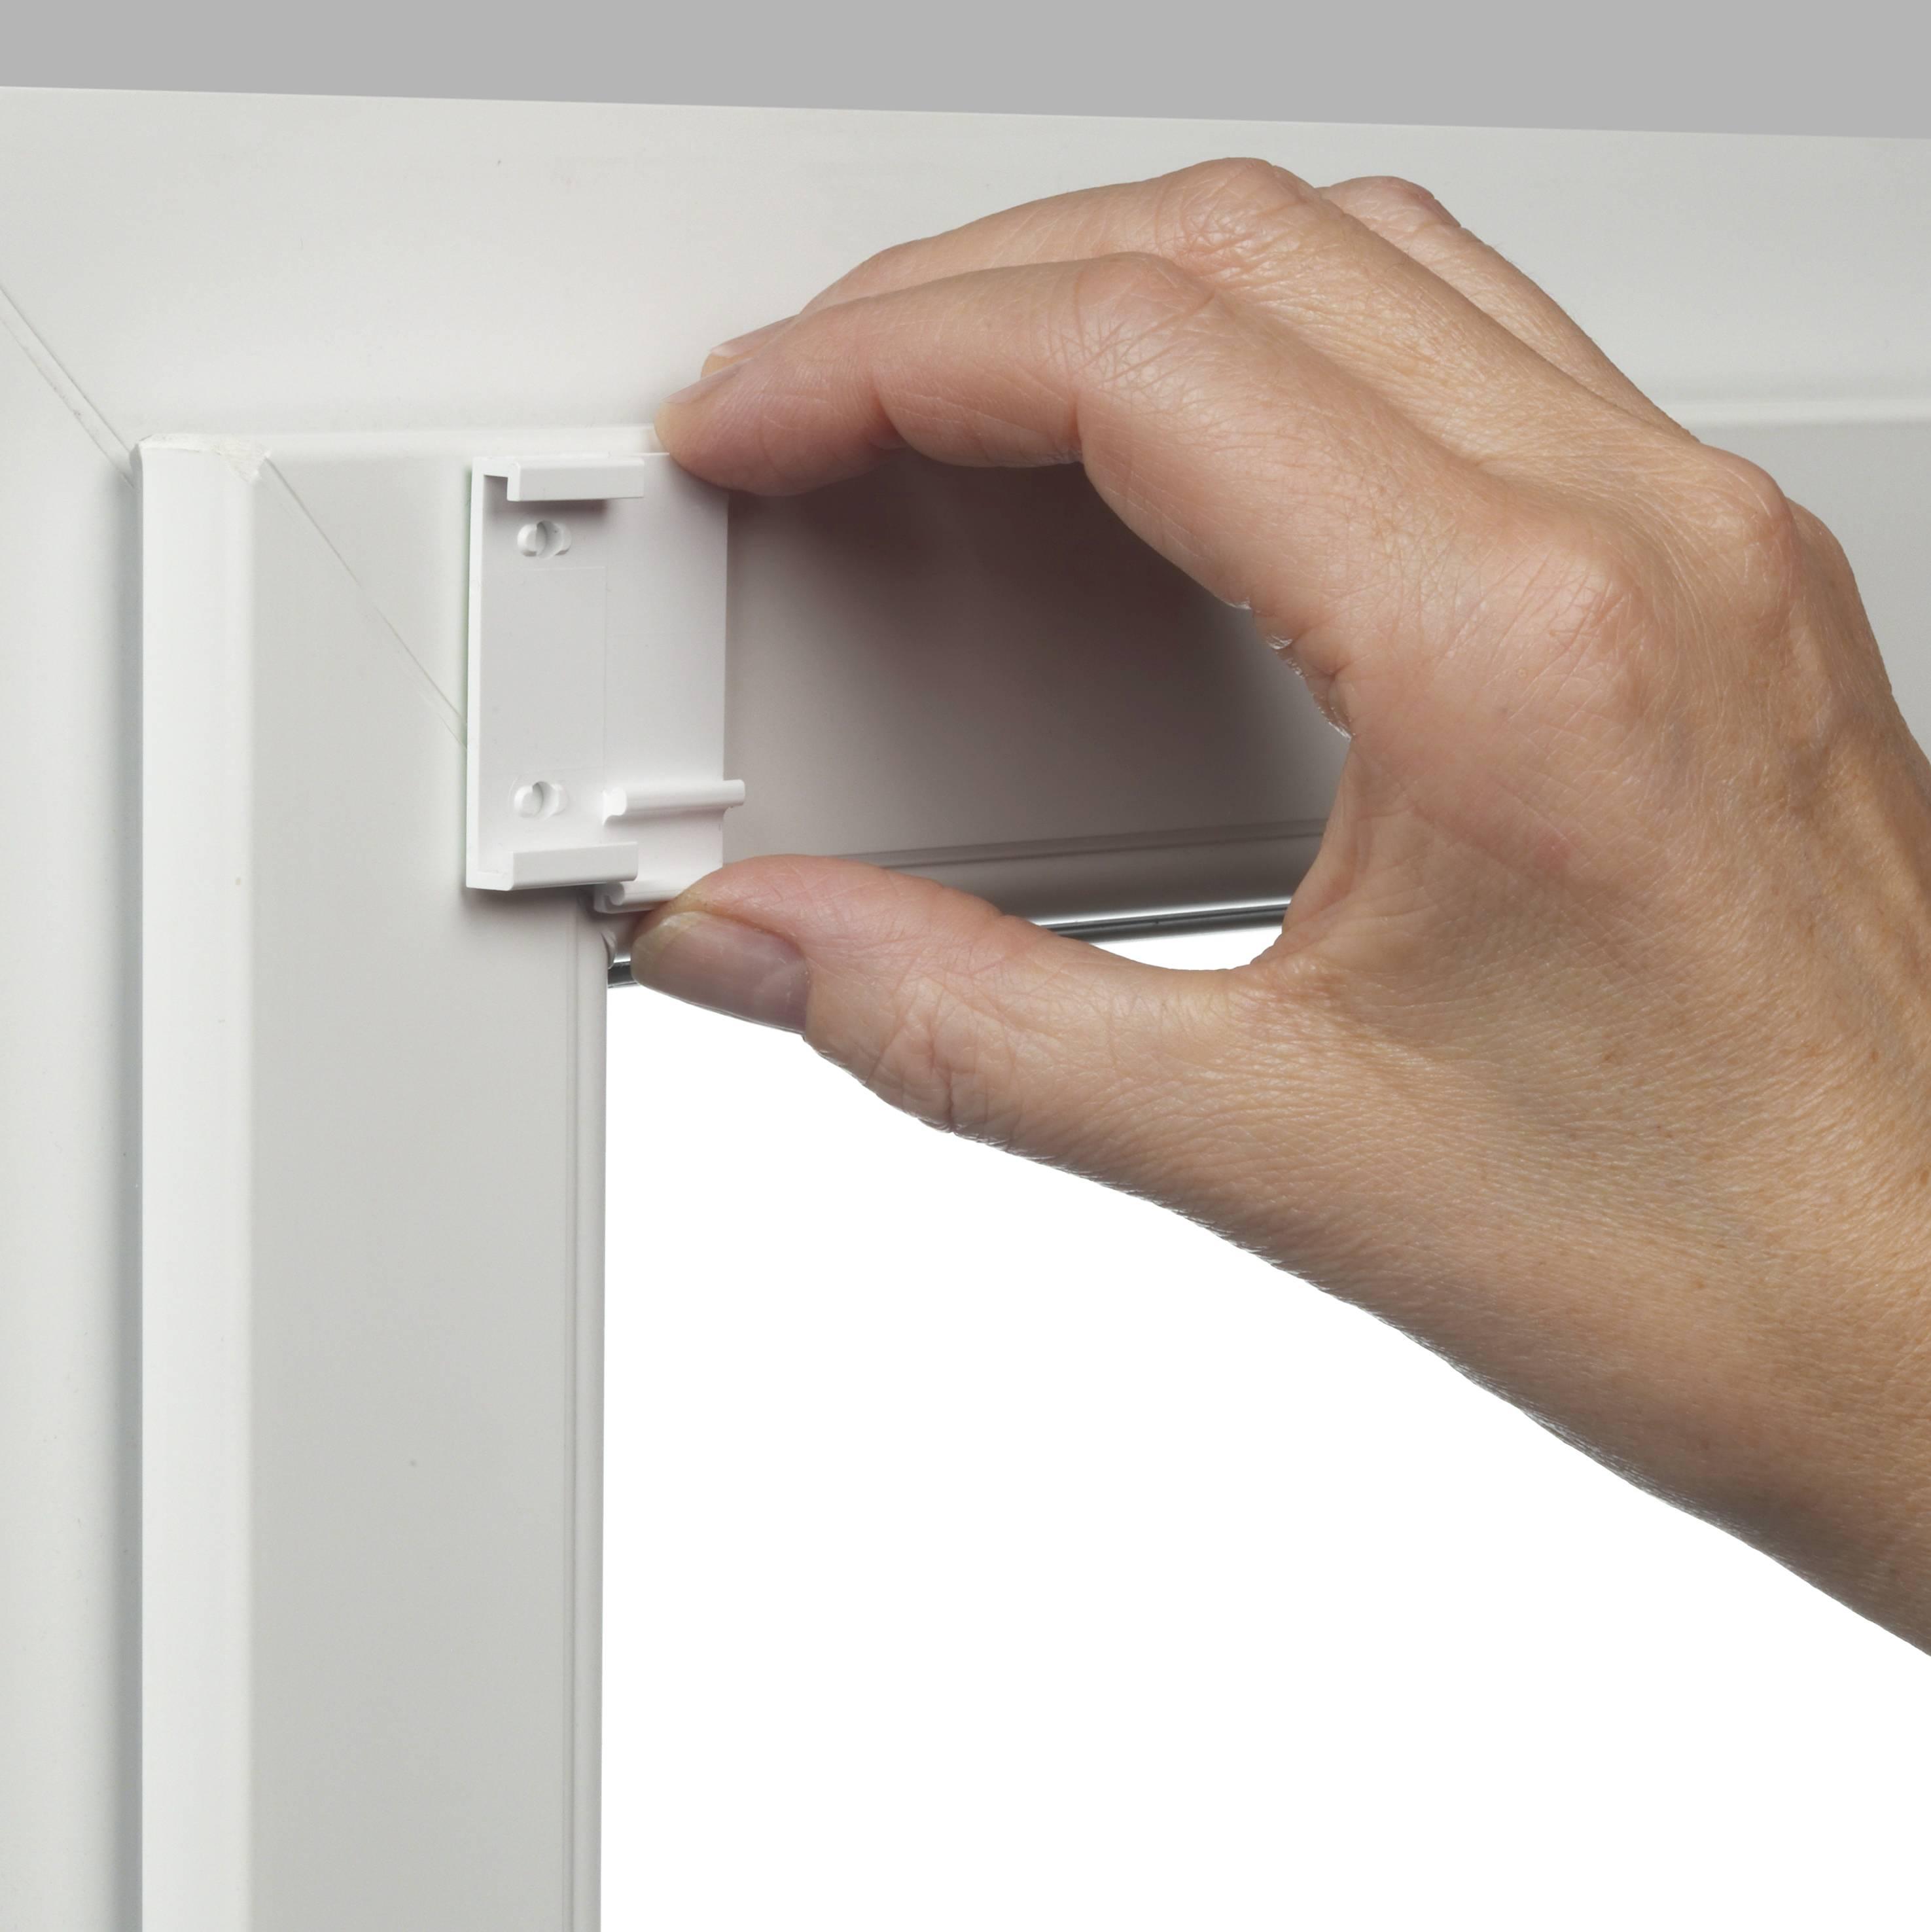 easyfix rollo thermo wei 90 x 210 cm 31544. Black Bedroom Furniture Sets. Home Design Ideas